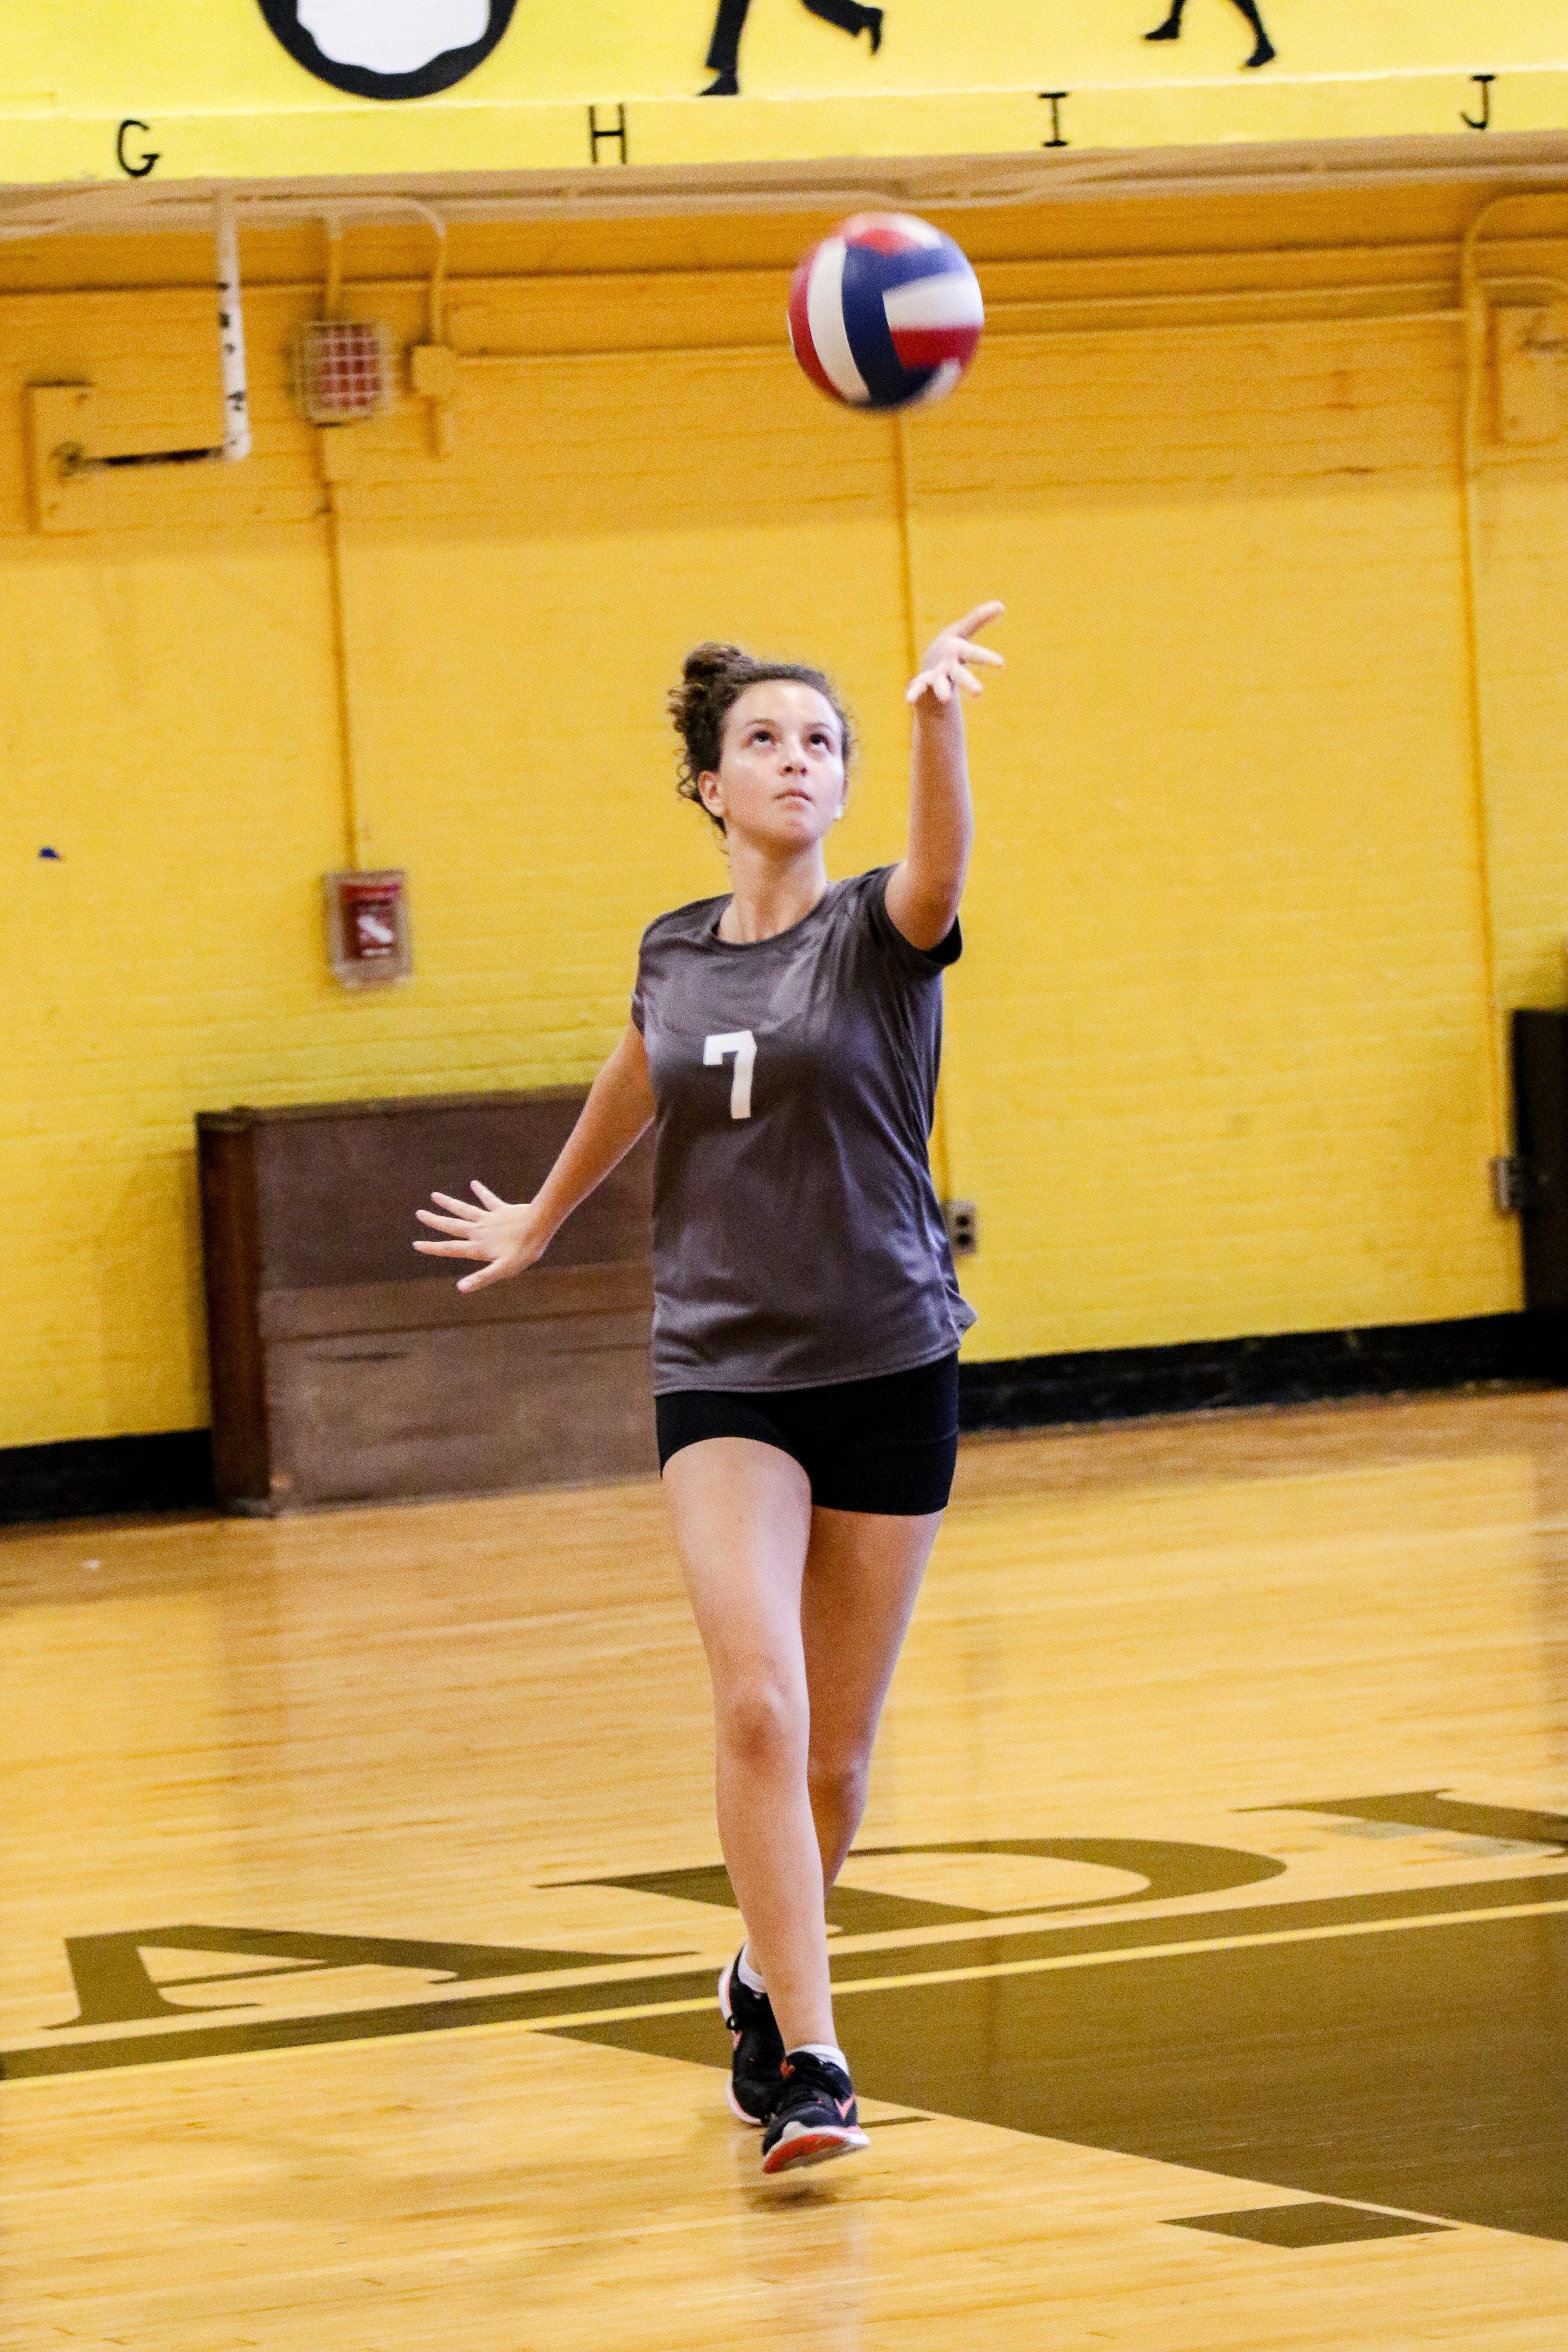 Carelle Zak '21 serves against Lincoln High School.  Photo Credit: Continental Studios